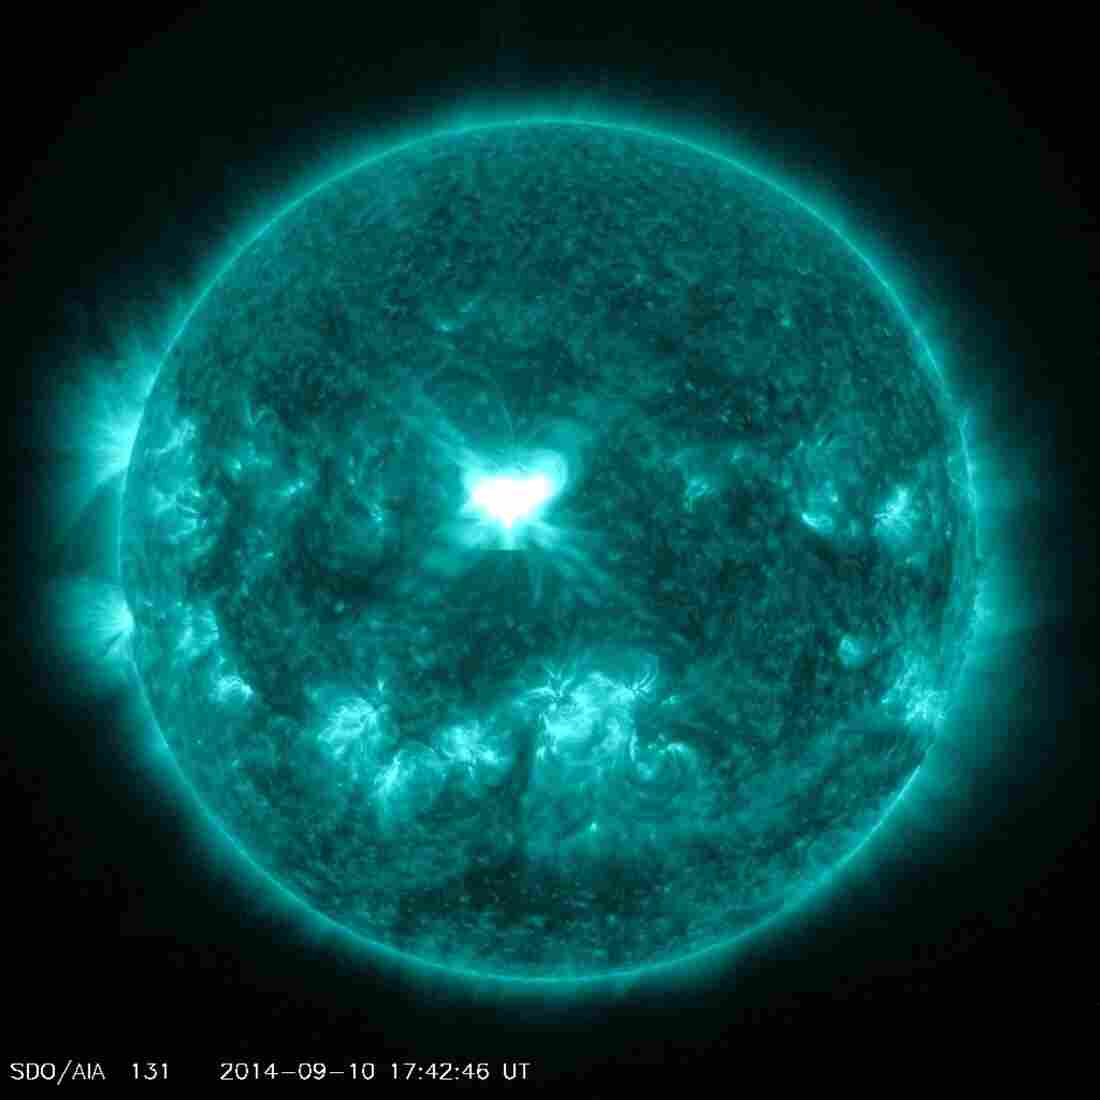 NASA's Solar Dynamics Observatory spacecraft captures Wednesday's solar flare eruption.